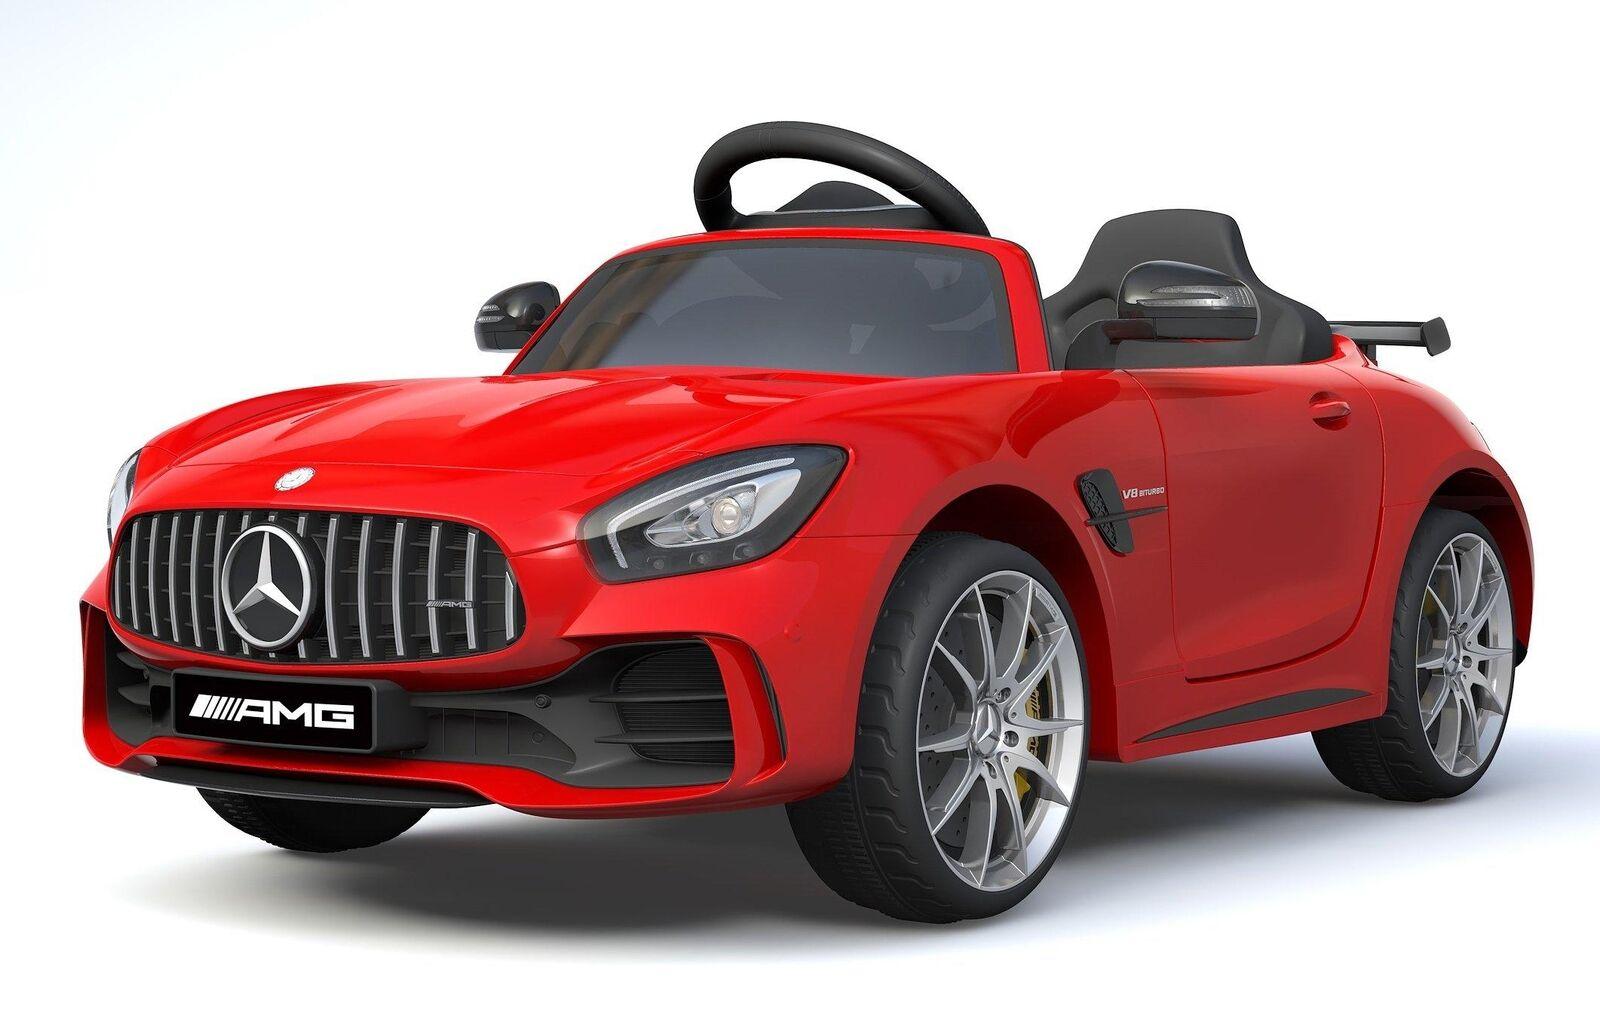 Lizenzierte Mercedes Benz GTR 12V Motoren Kinder Elektro-Fahrt auf Auto Rot